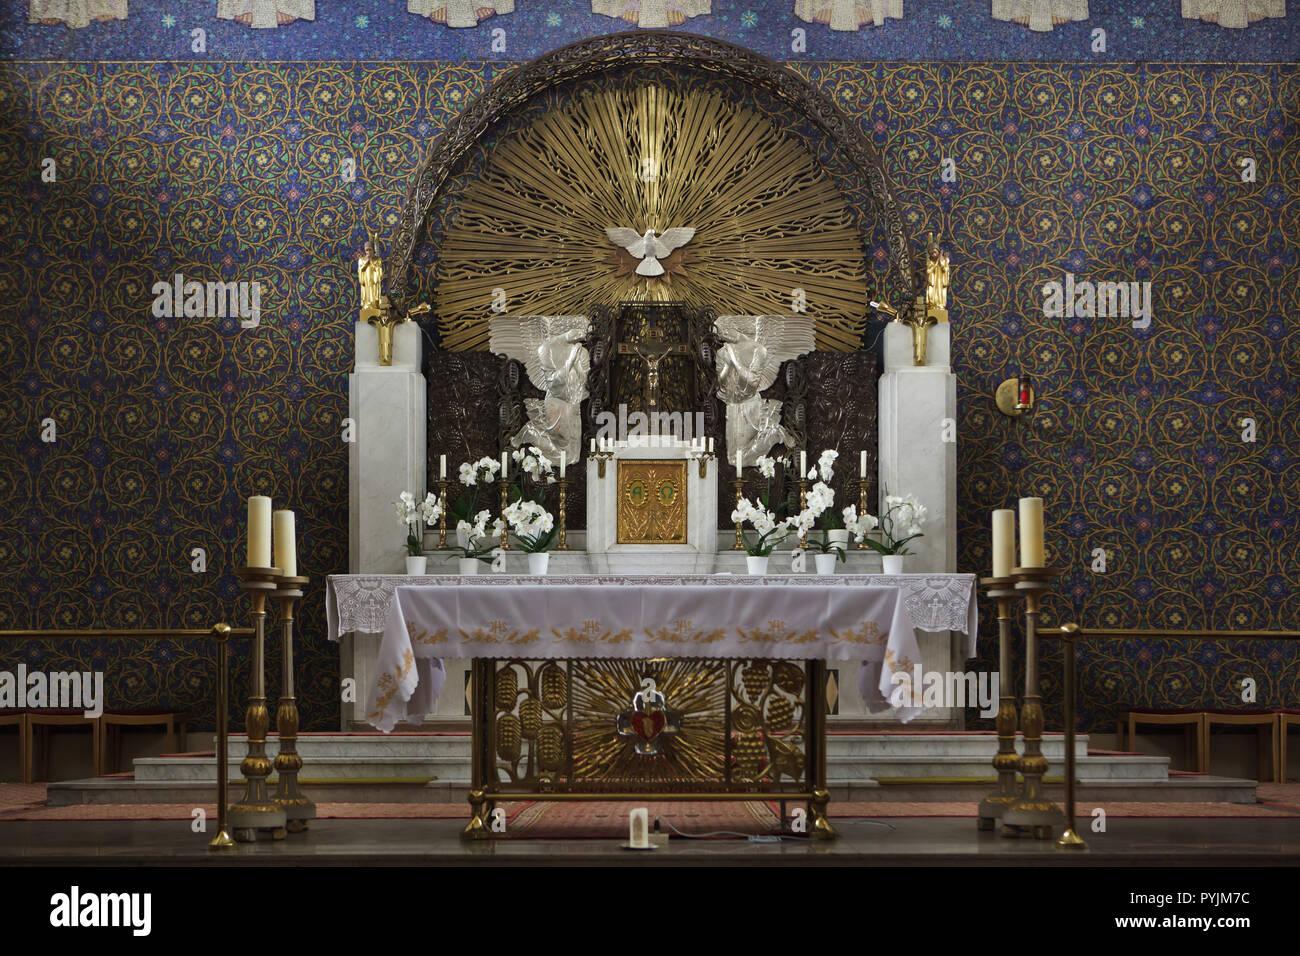 Main altar of the Heilig-Geist-Kirche (Church of the Holy Spirit) designed by Slovenian modernist architect Jože Plečnik (1911) in Ottakring destrict in Vienna, Austria. Stock Photo